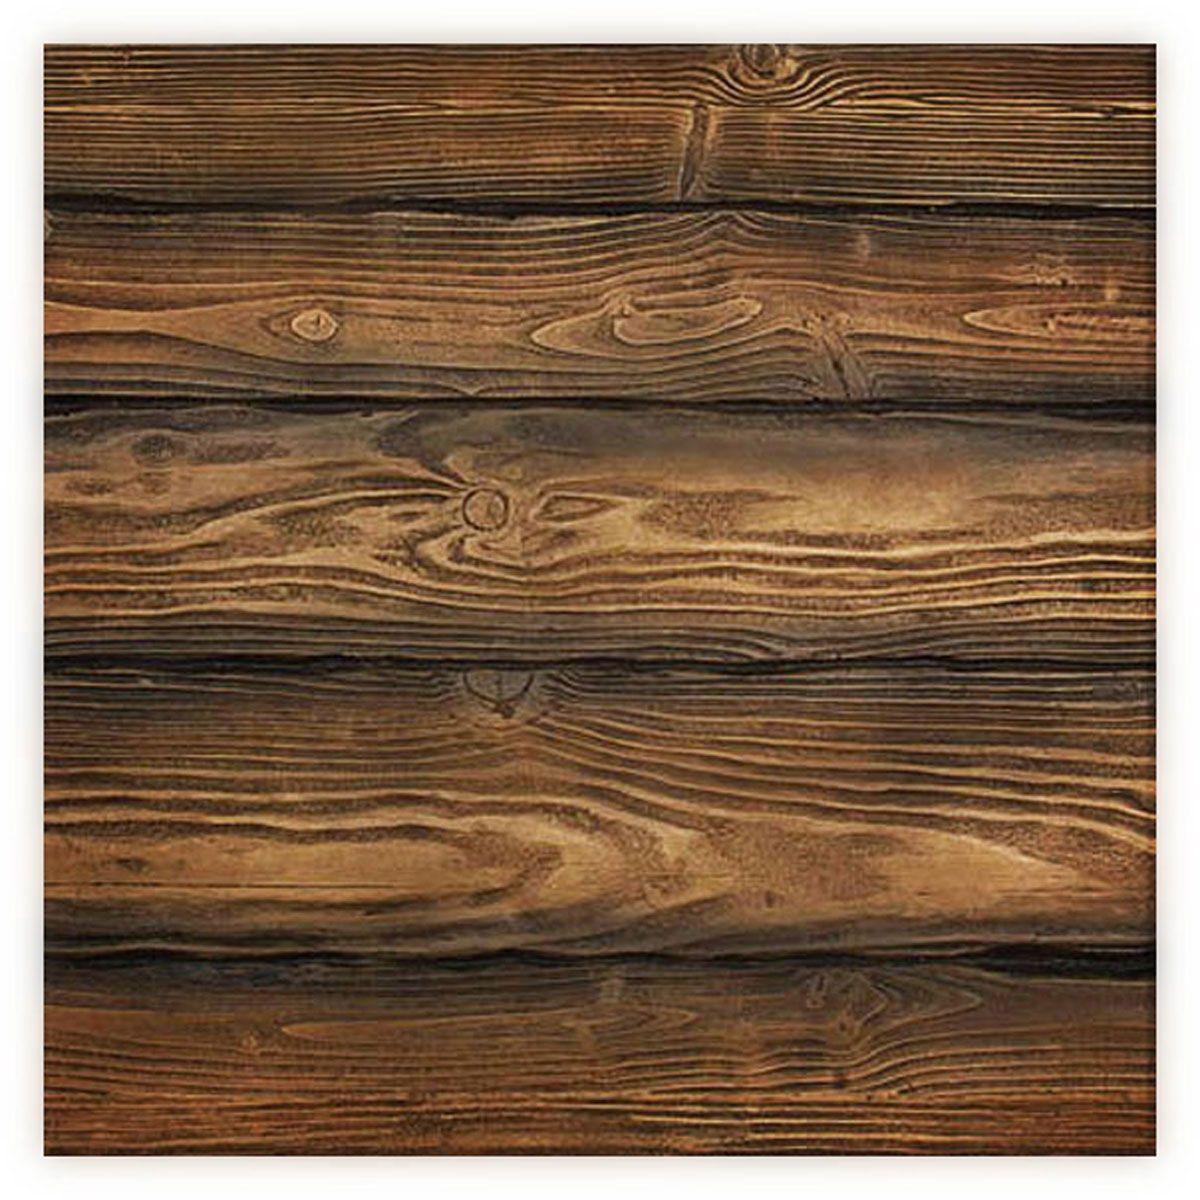 Ekena Millwork Sample Pn916wm 8 Inch W X 10 Inch H Sand Blas Wood Panel Siding Wood Siding Exterior Wood Siding